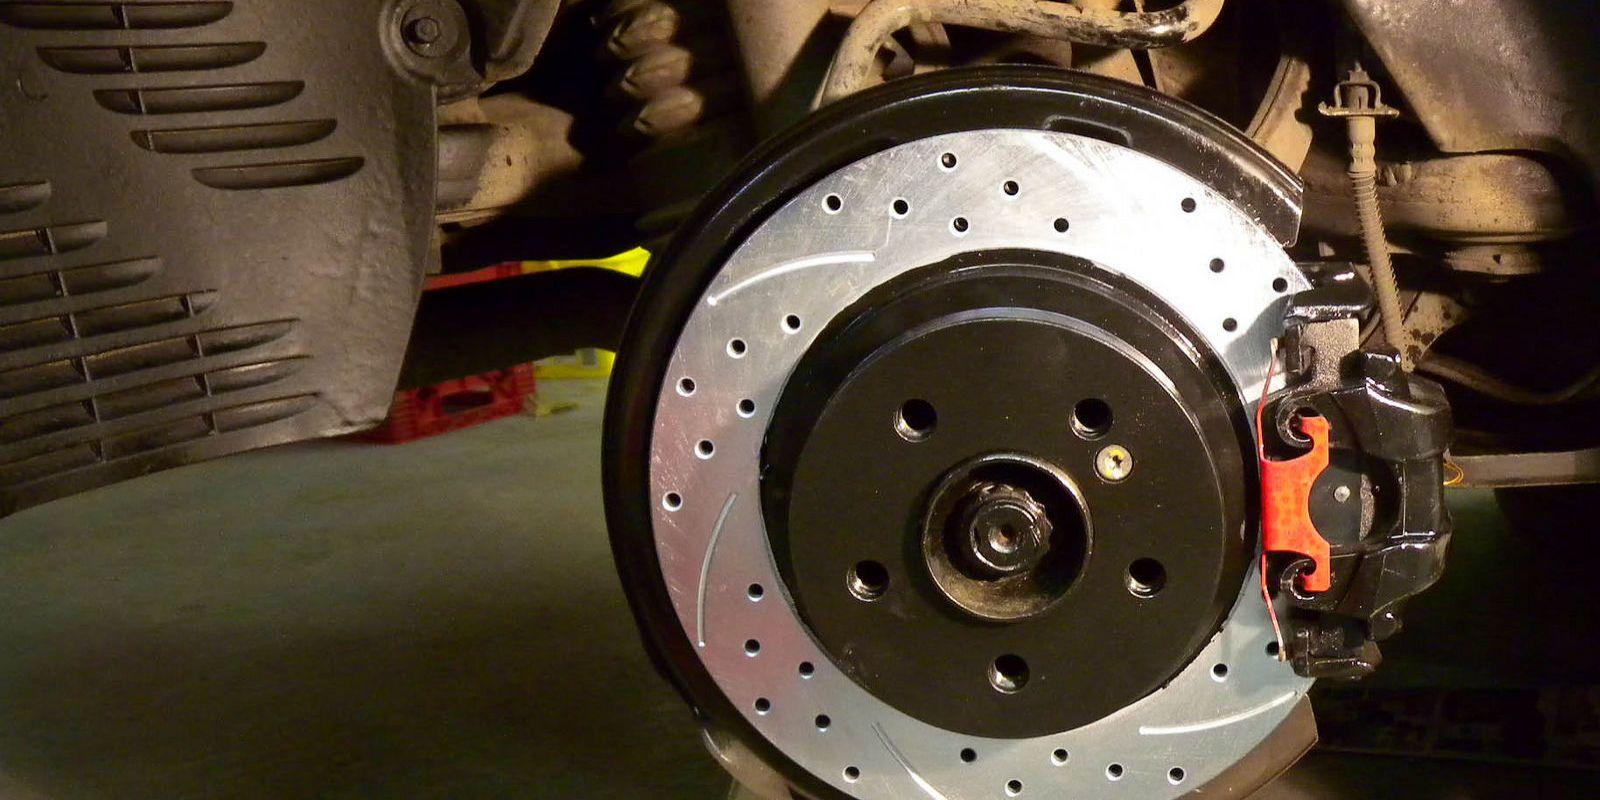 AntiLock Brakes  ABS Brakes Troubleshooting  How to Troubleshoot Anti Lock Brakes Problems